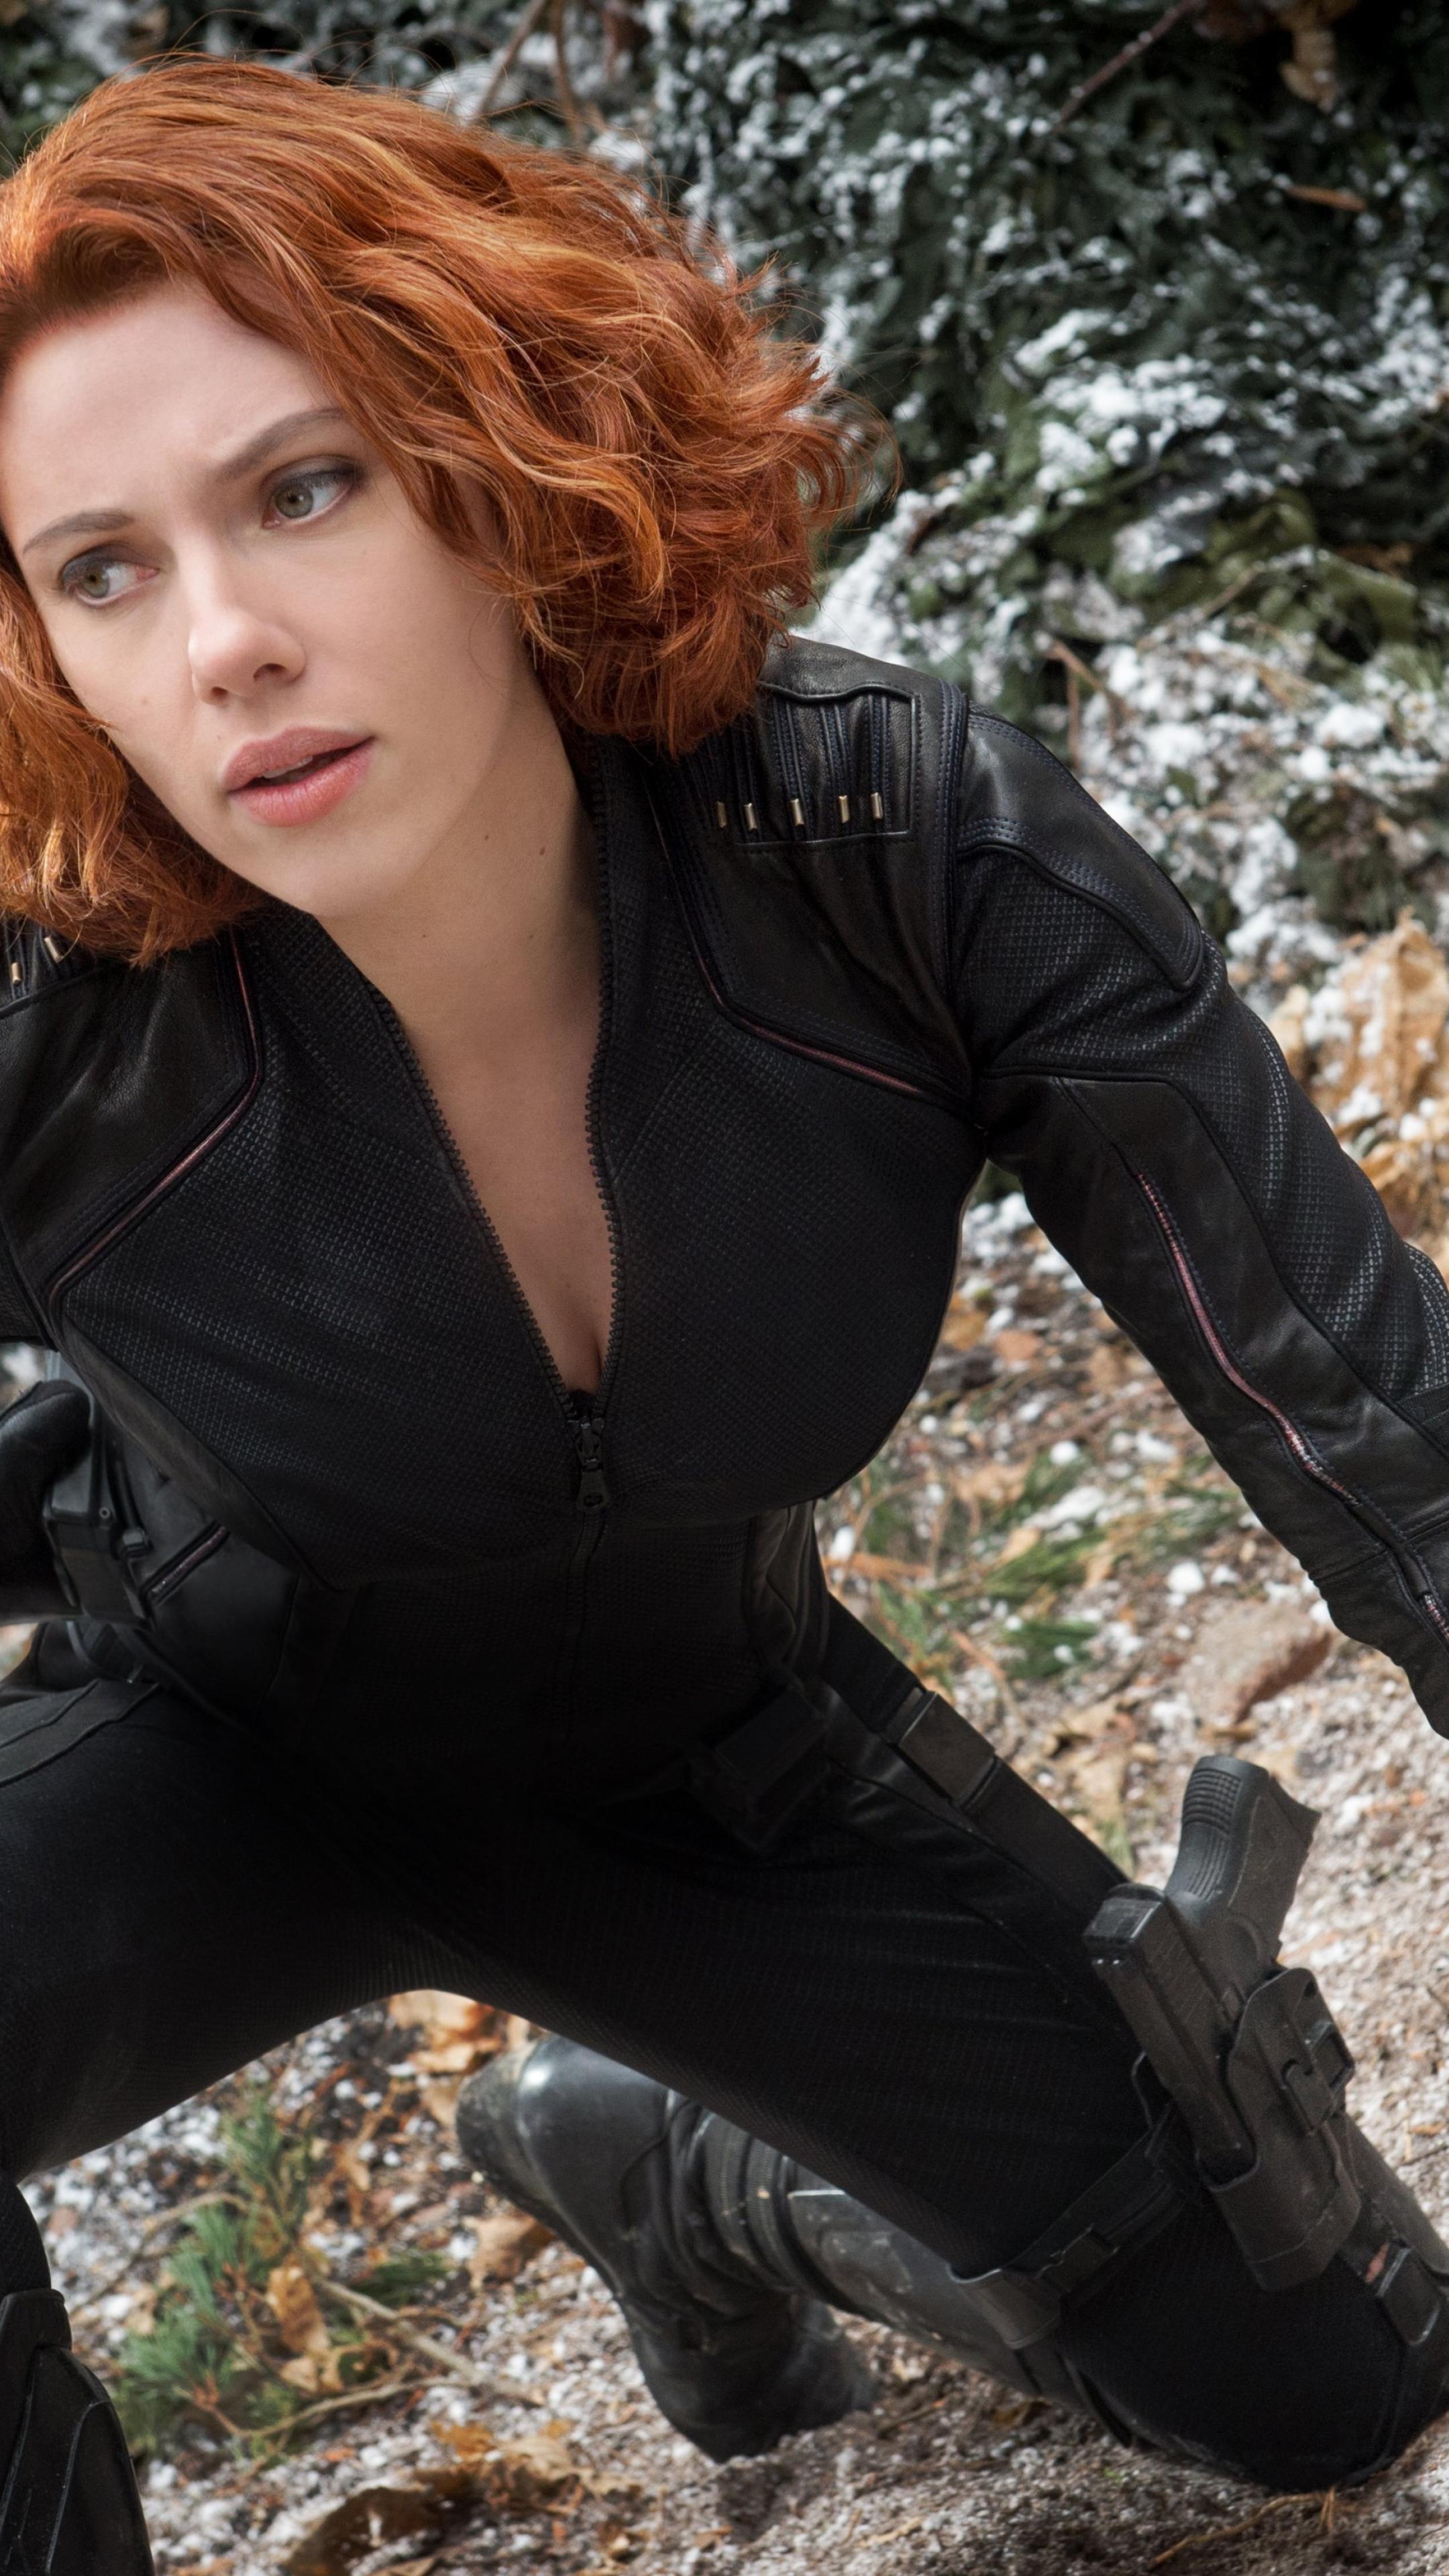 2160x3840 Avengers Age Of Ultron 2 Scarlett Johansson Pics